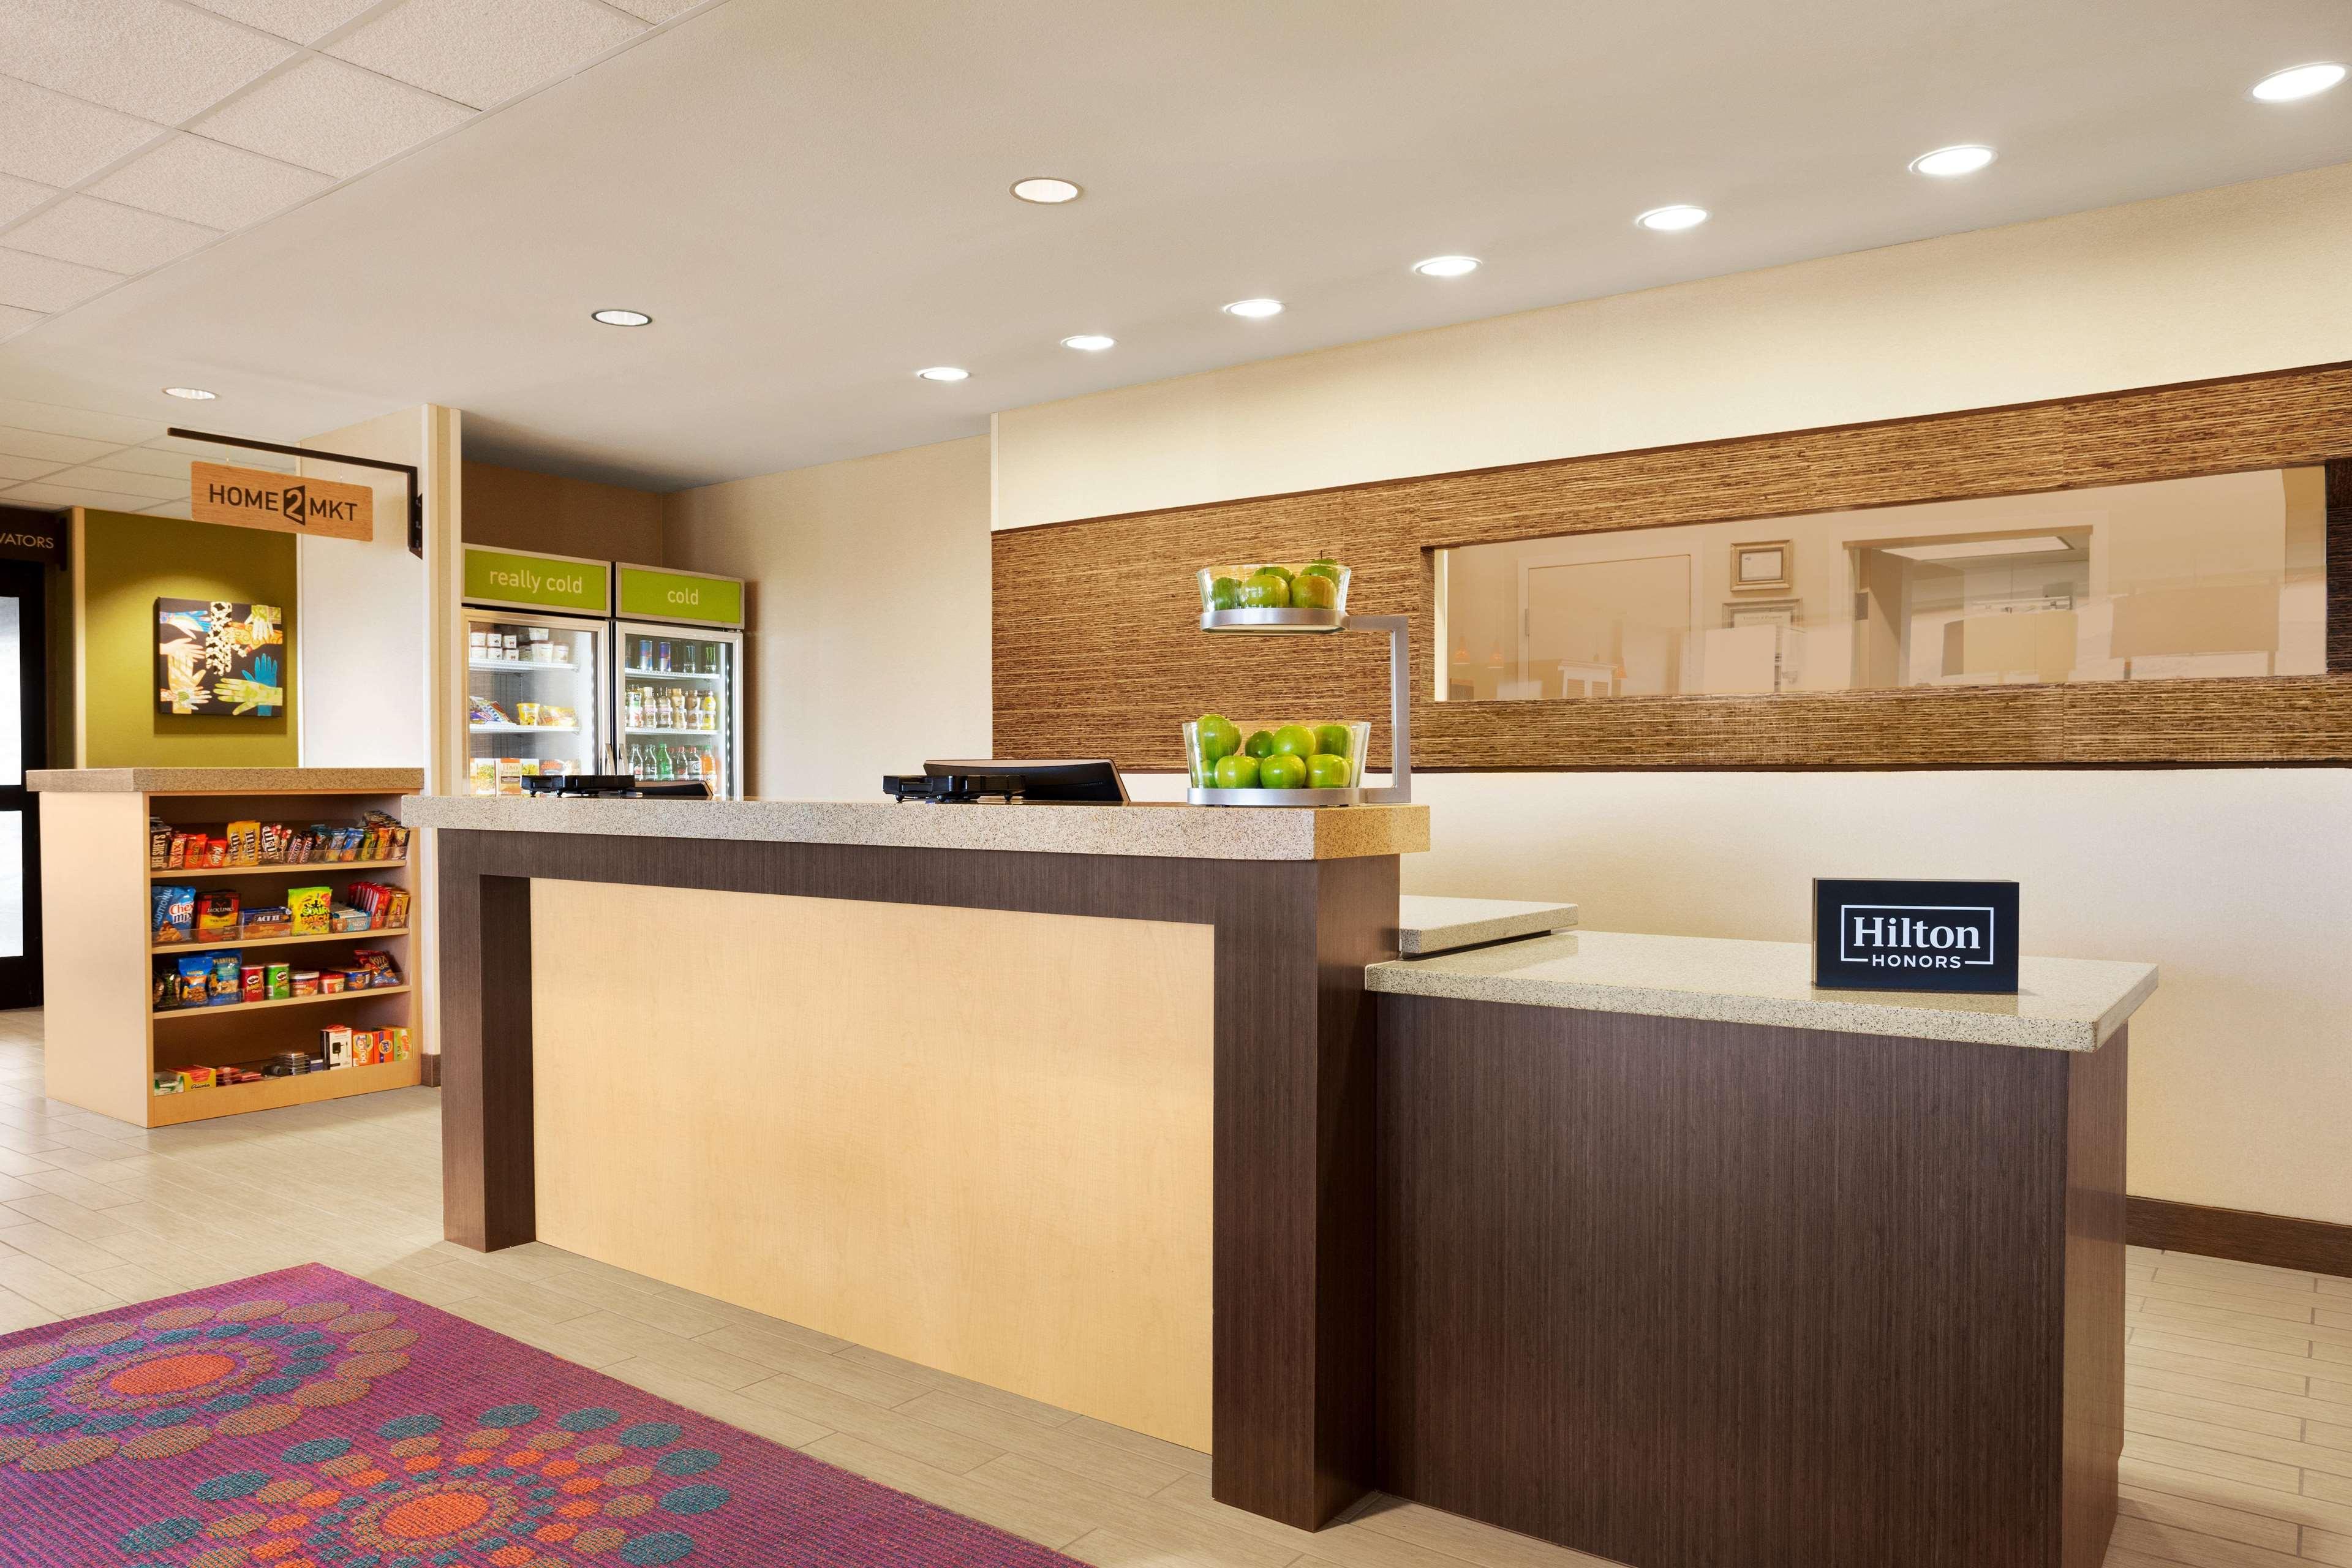 Home2 Suites by Hilton Elko image 8